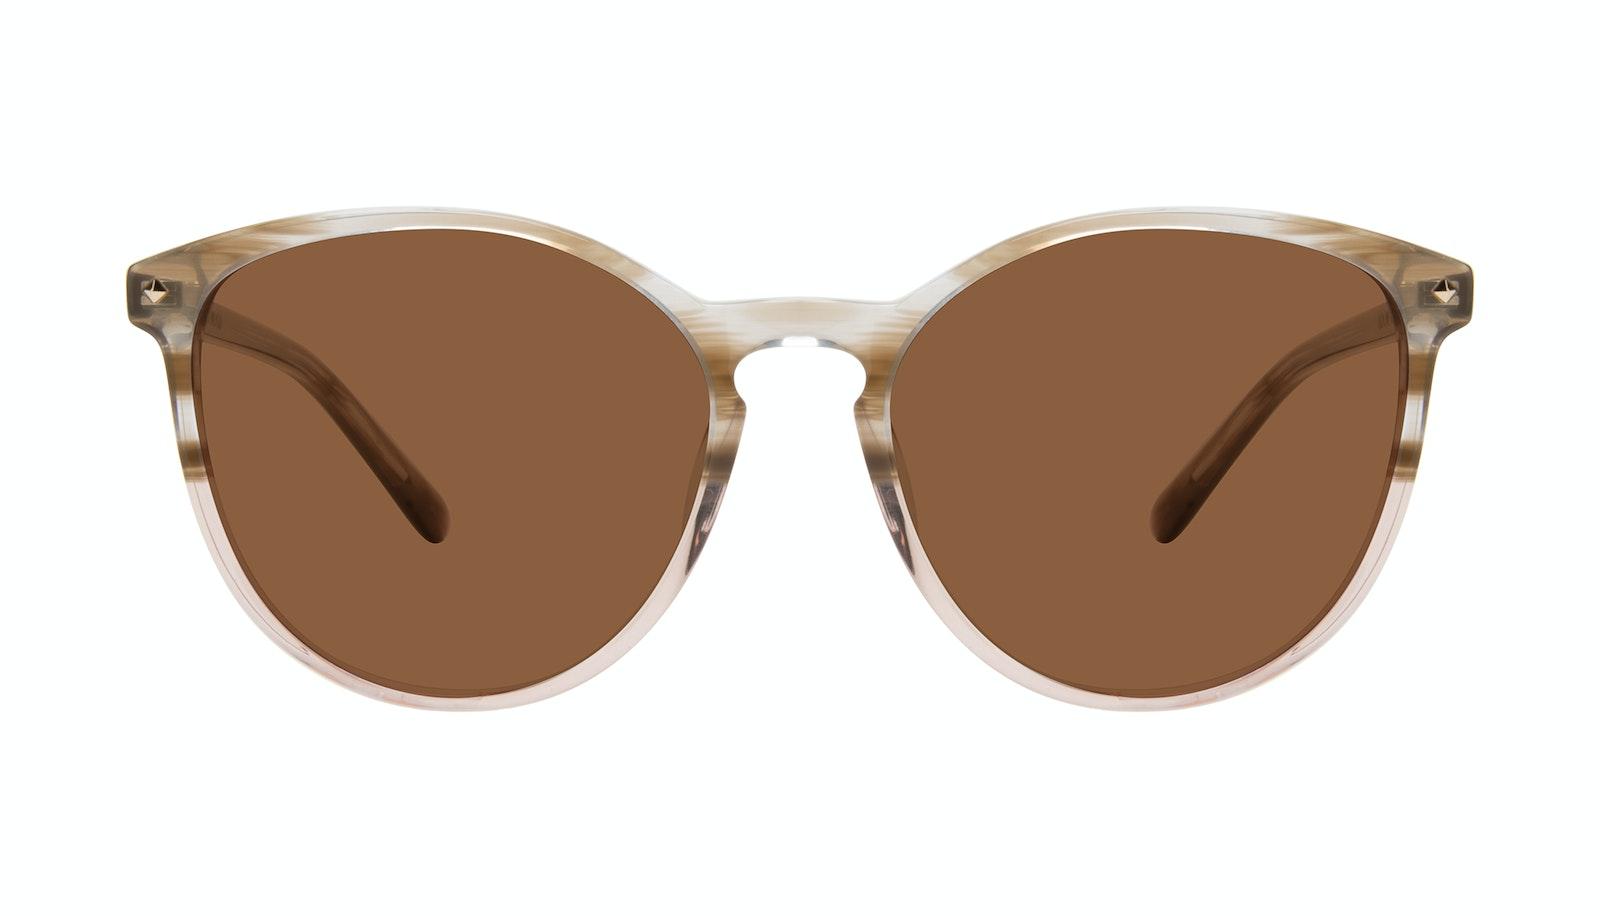 Affordable Fashion Glasses Round Sunglasses Women Viva Rosewood